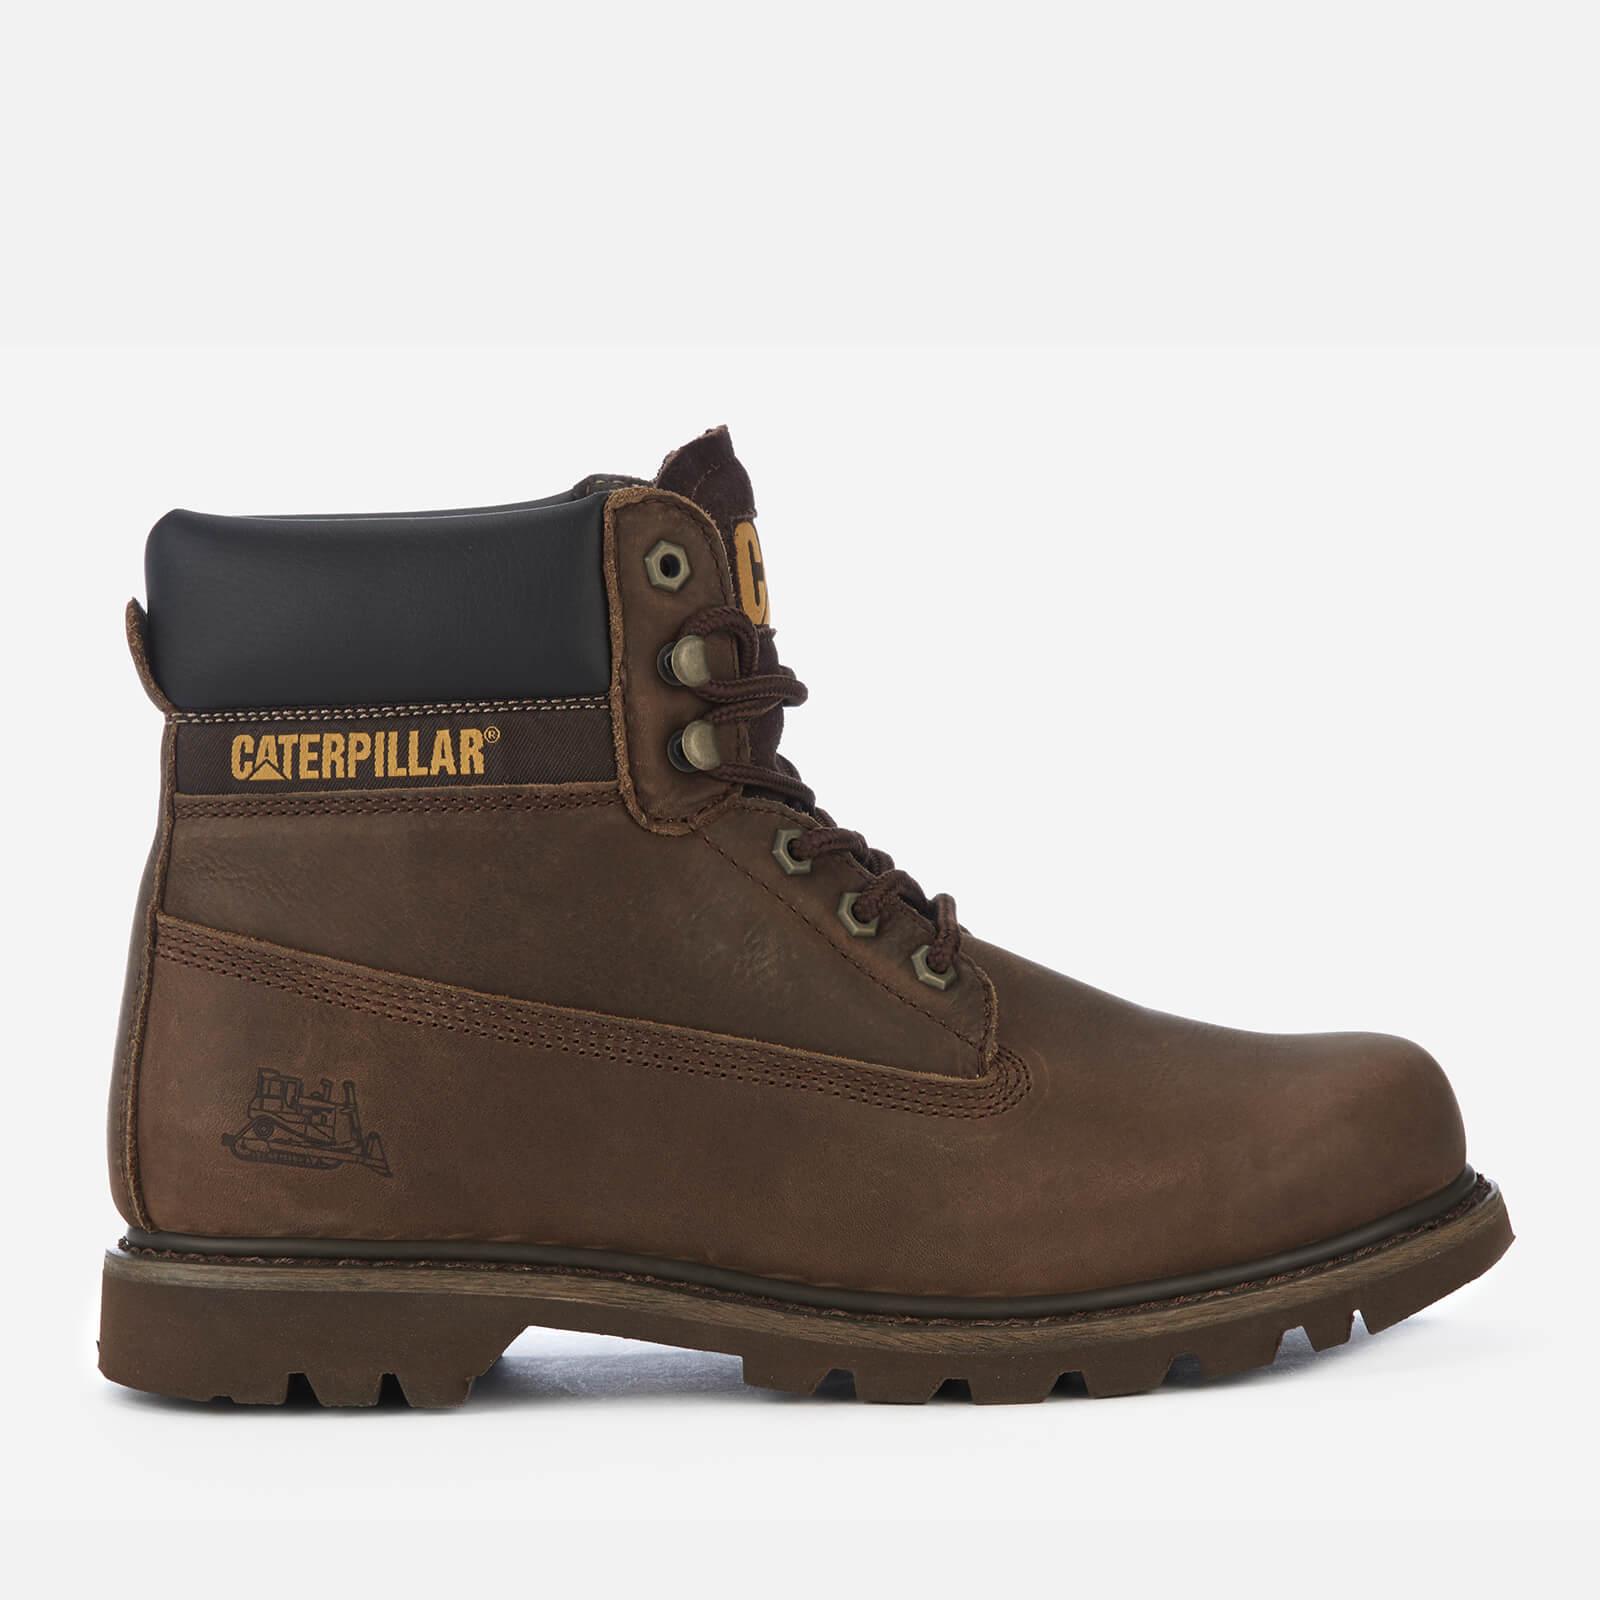 8b4477b98976a Caterpillar Men's Colorado Boots - Chocolate Mens Footwear | Zavvi Australia